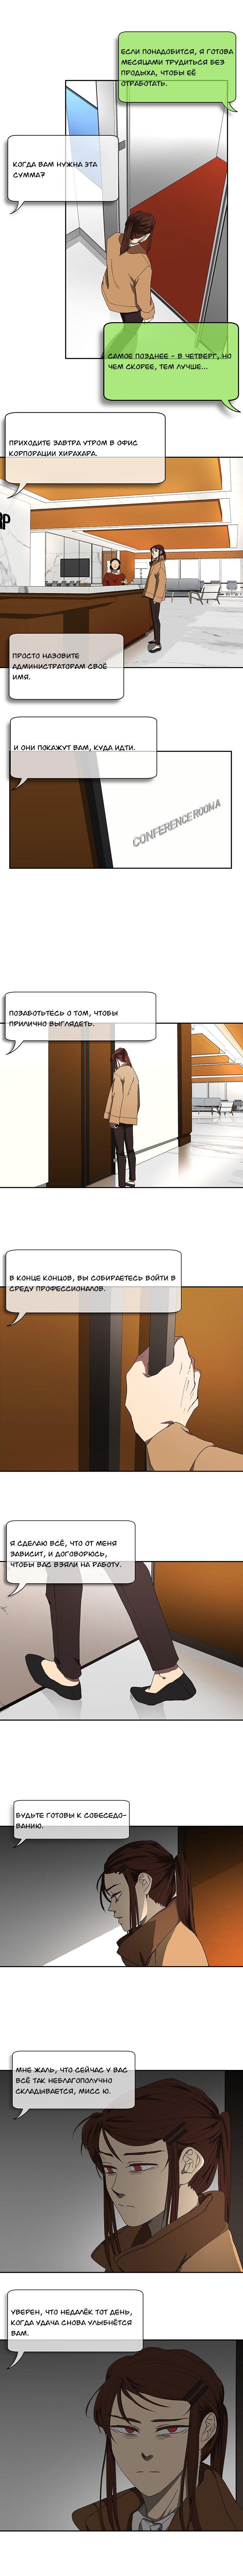 Манга Я люблю Ю / I love Yoo  - Том 1 Глава 47 Страница 11